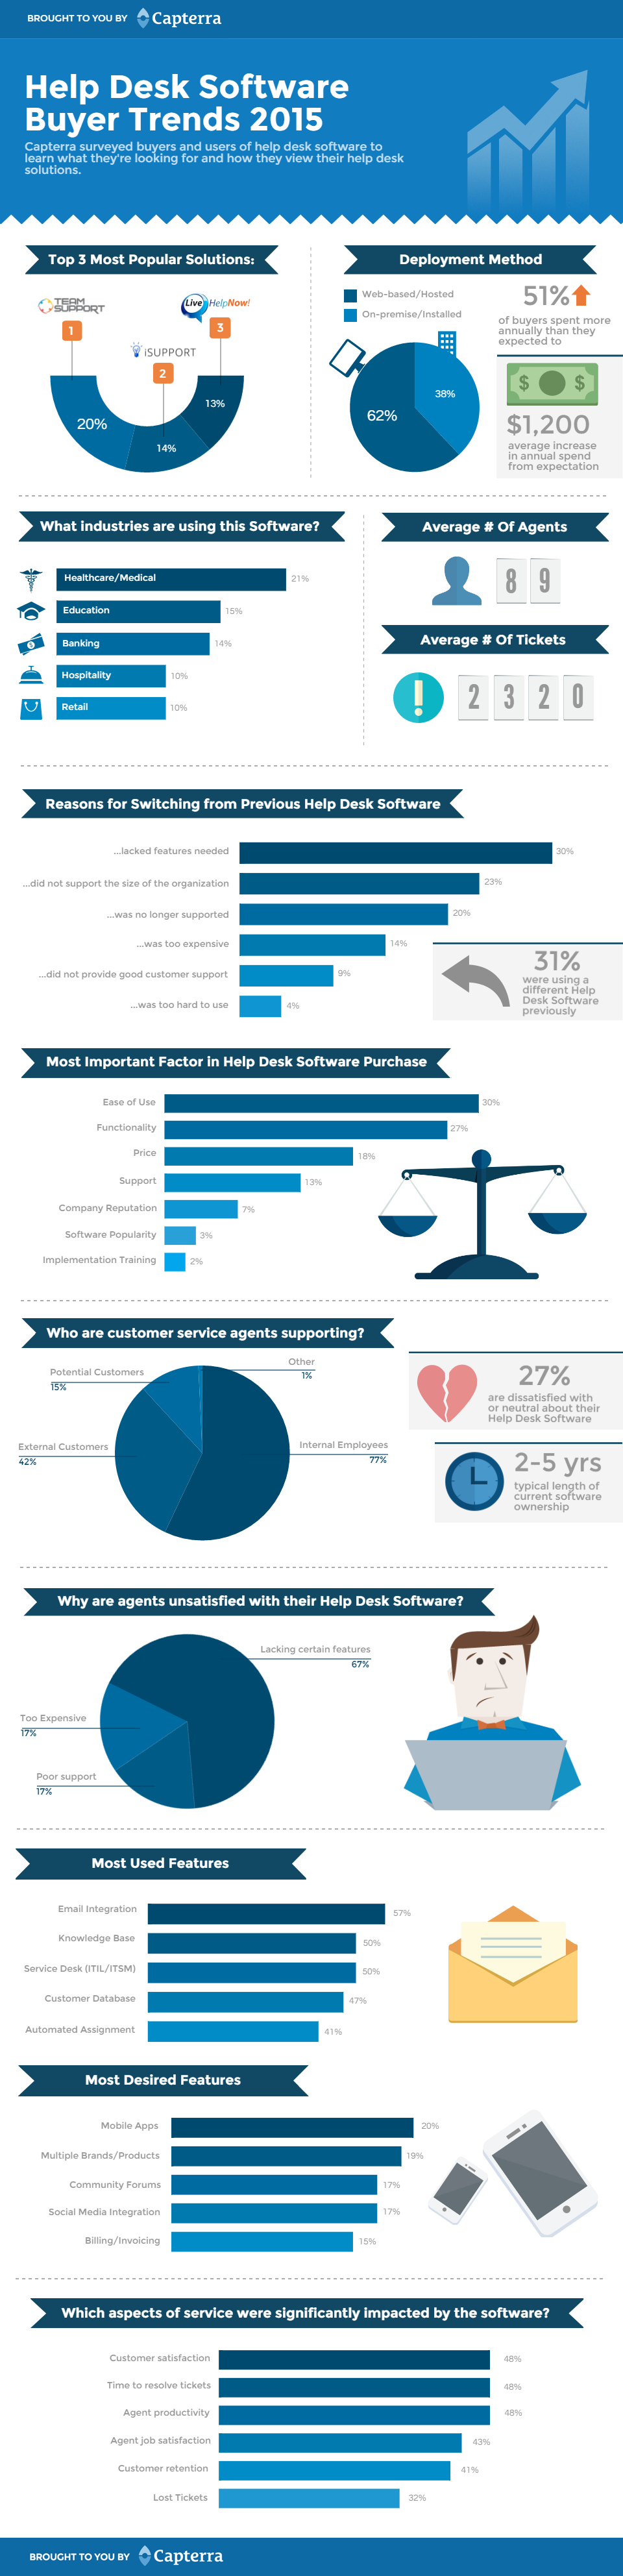 Help-desk-buyer-trends-infographic-v001